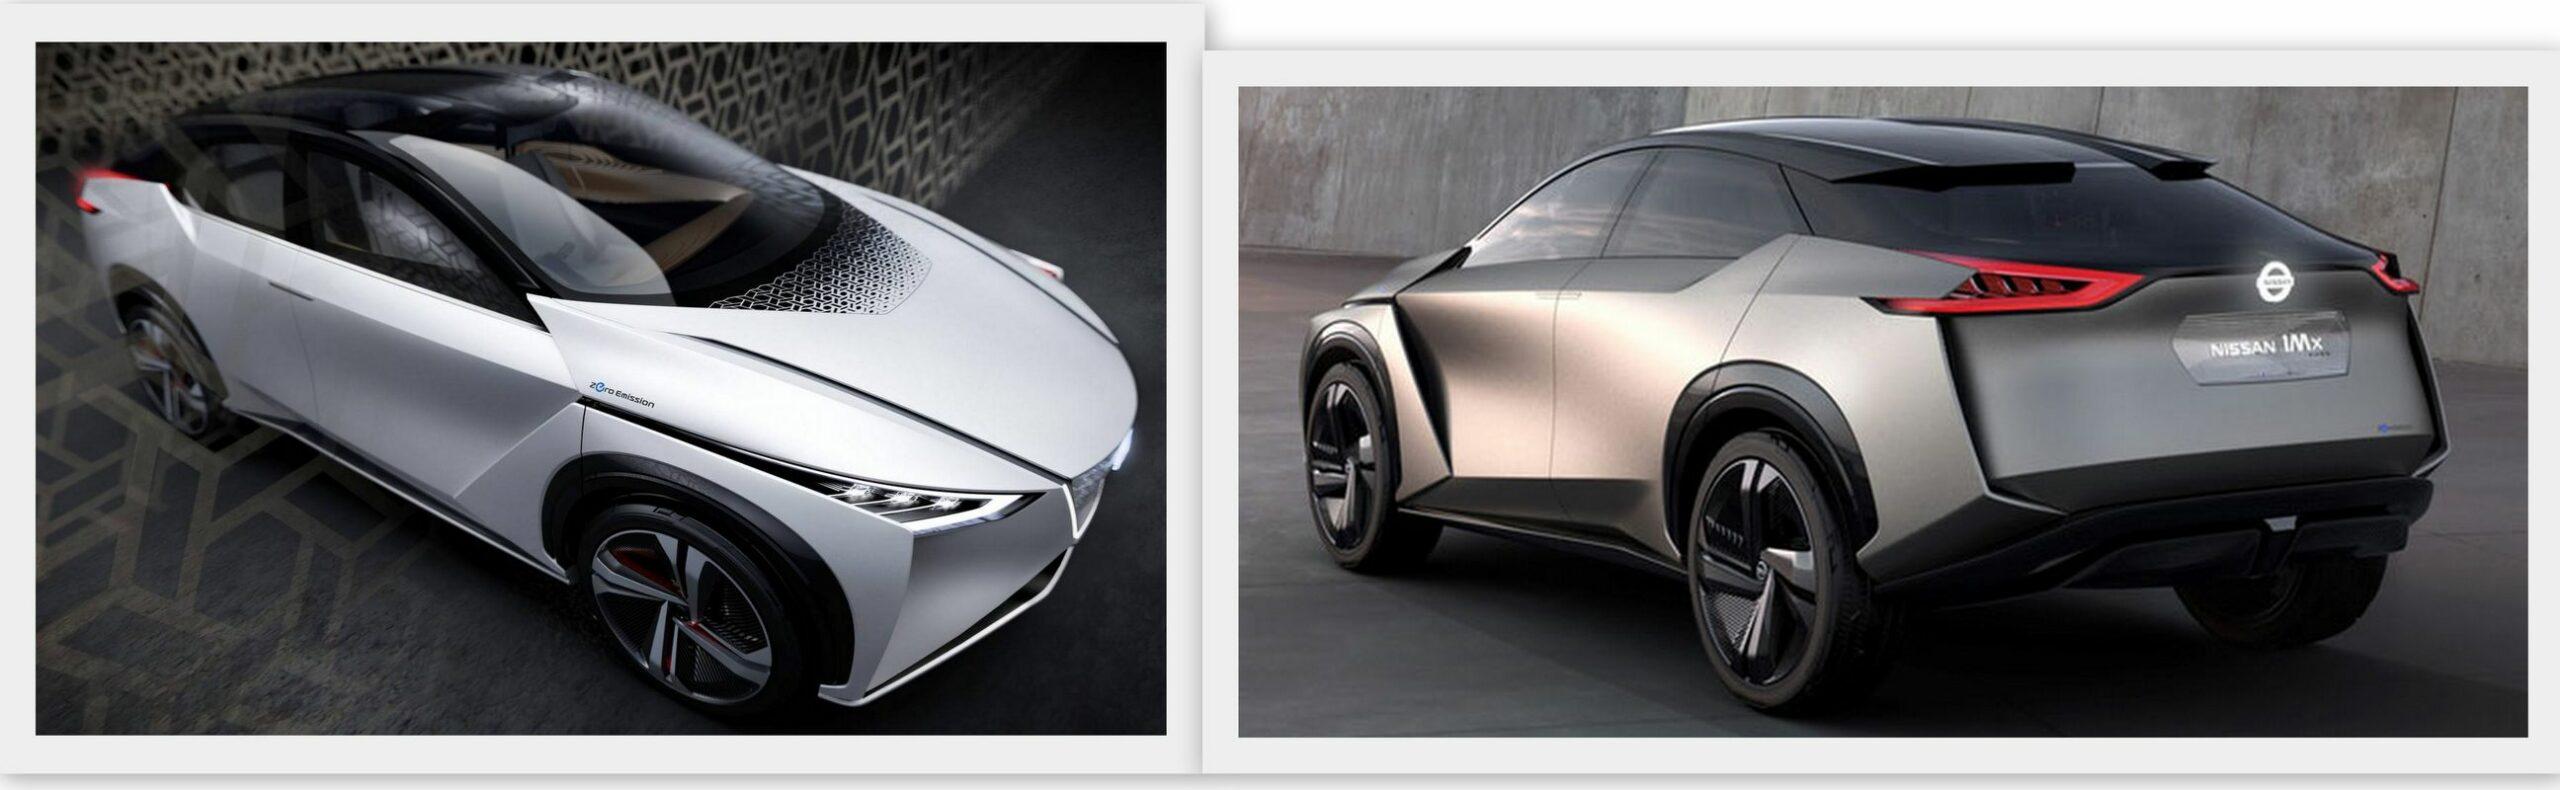 Nissan IMx 2021